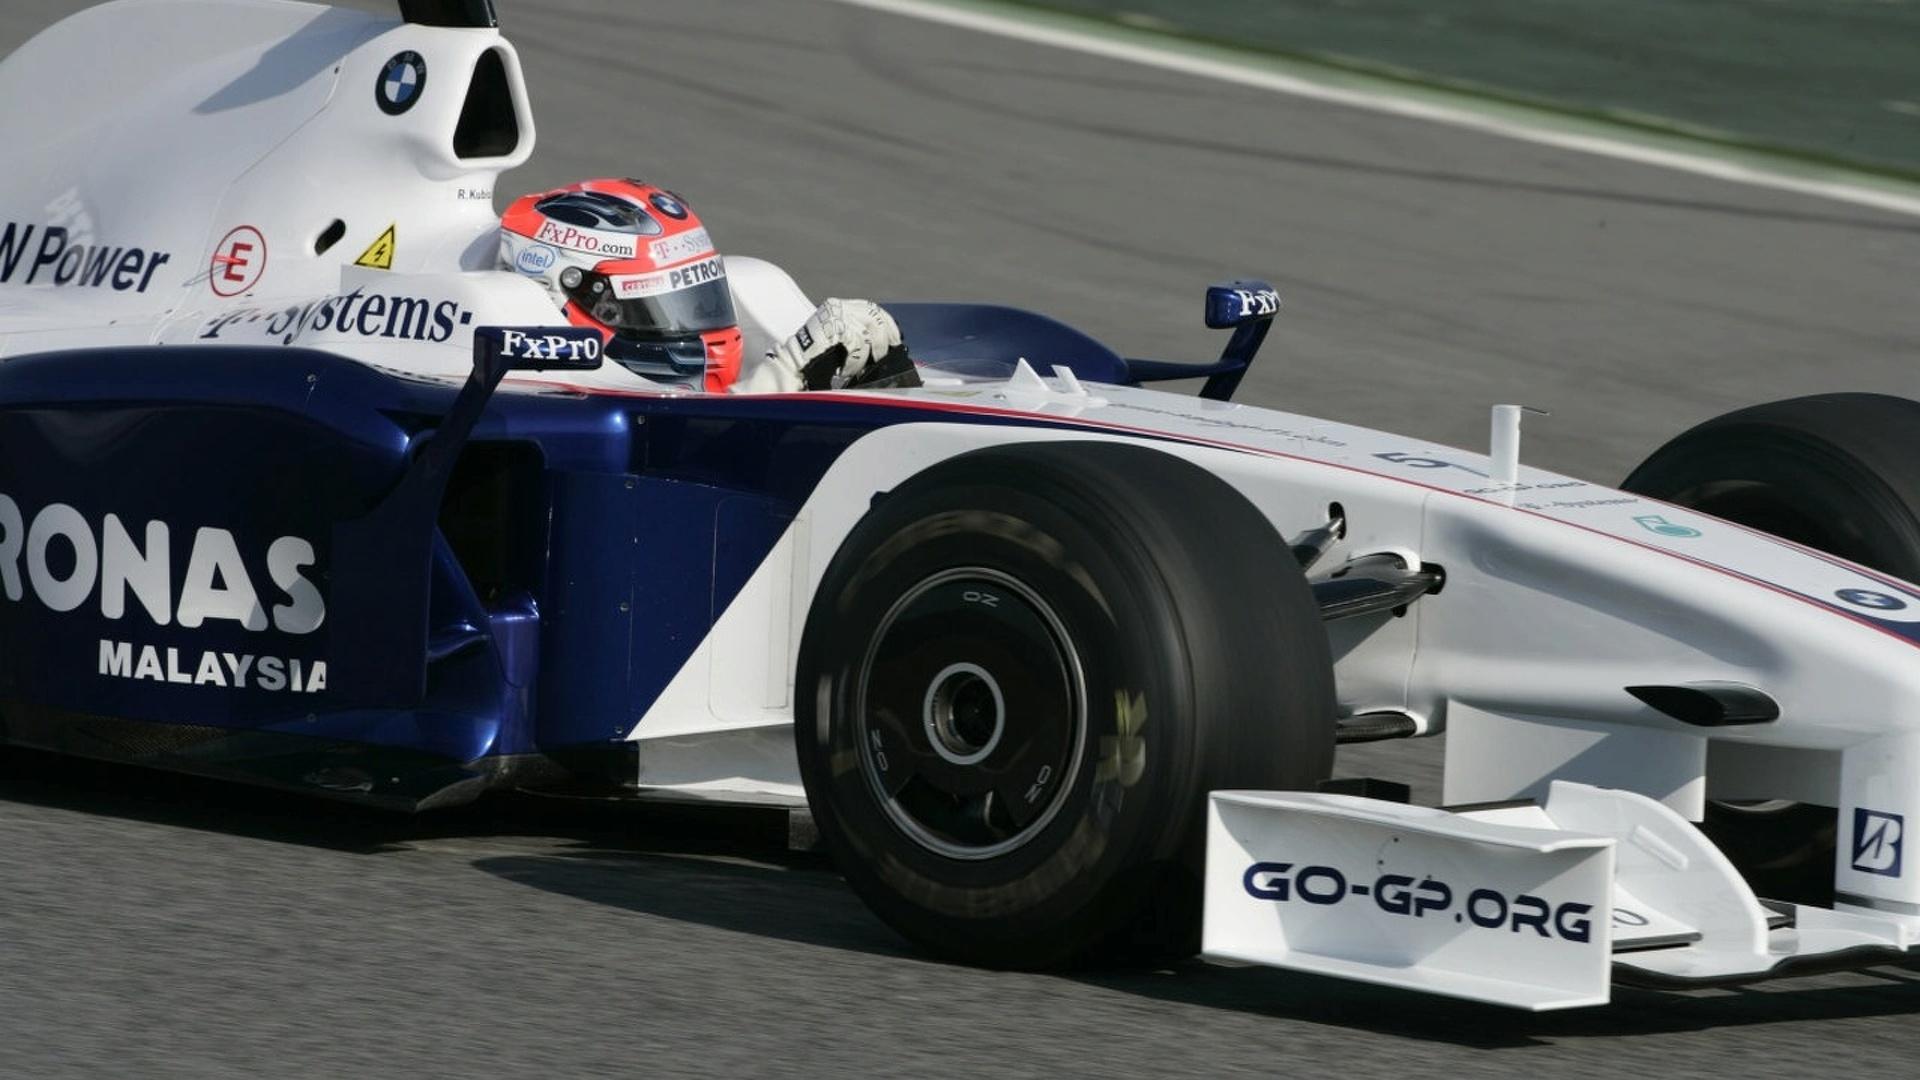 BMW-Sauber bids for 2010 team entry